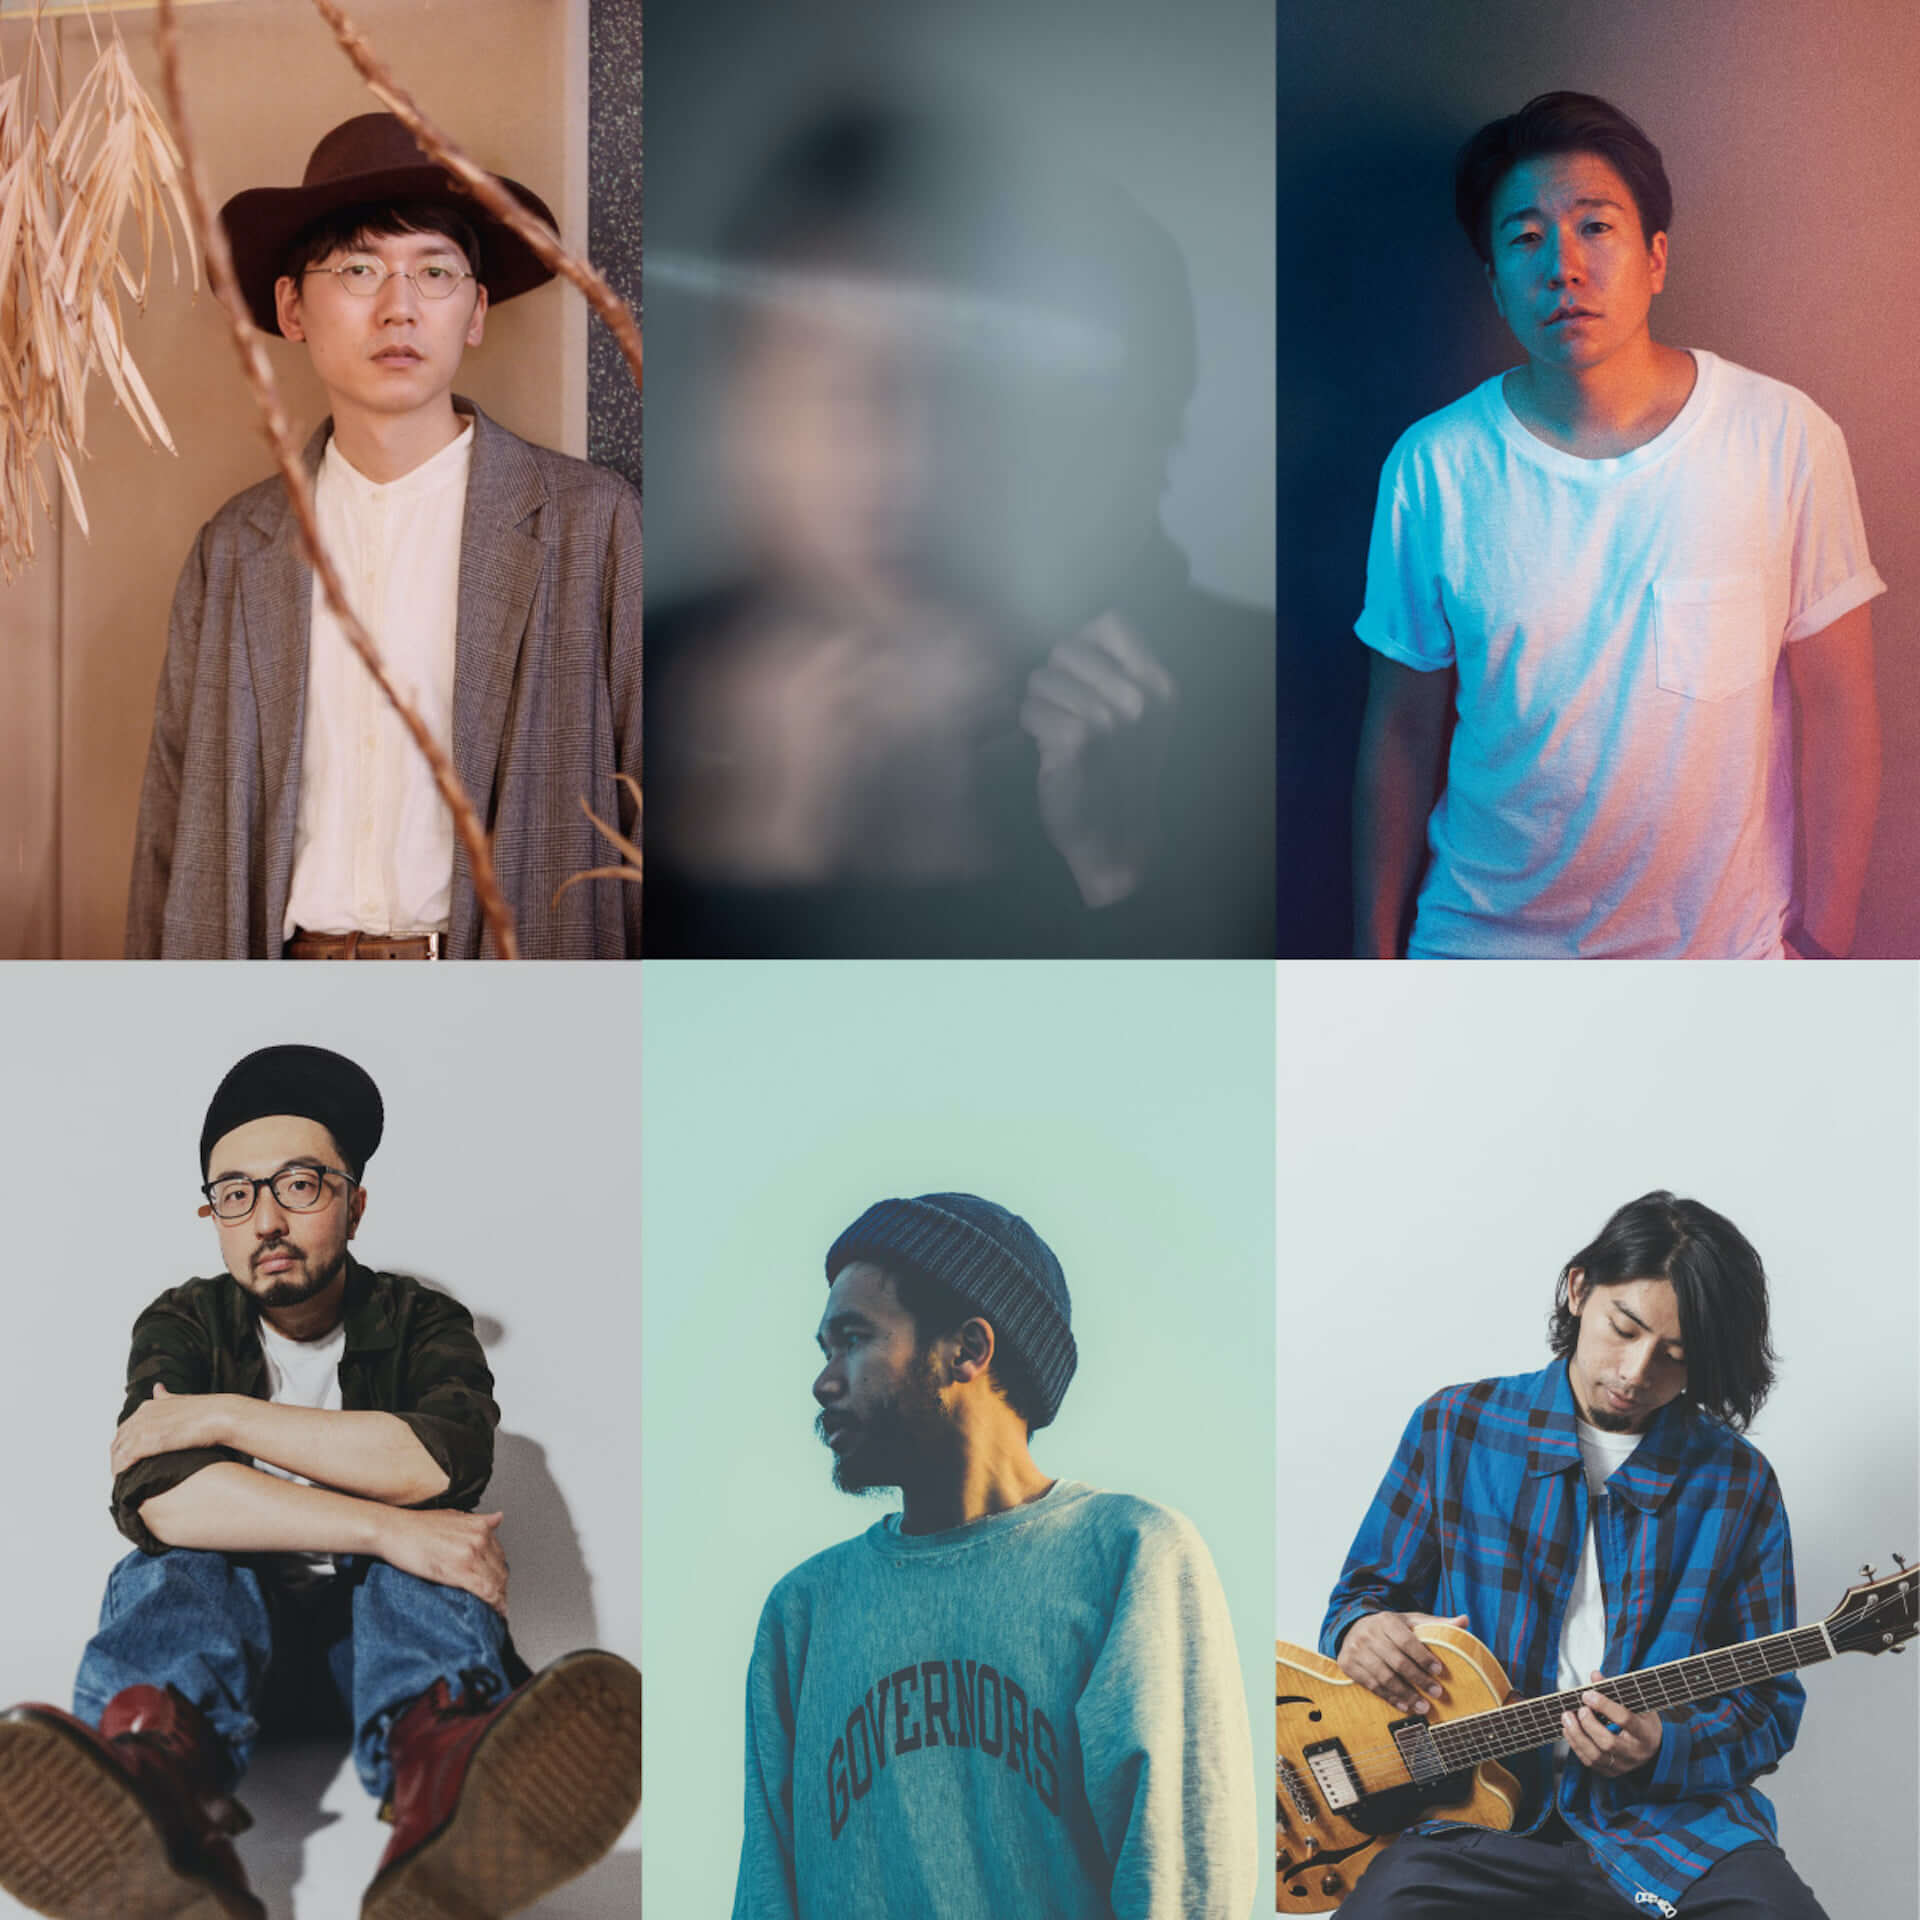 〈origami PRODUCTIONS〉からLo-Fi Hip Hop, Soulのコンピがリリース!mabanua、Shingo Suzuki、関口シンゴ、Kan Sano、Ovallらが参加 music200324_origami_productions_2-1920x1920